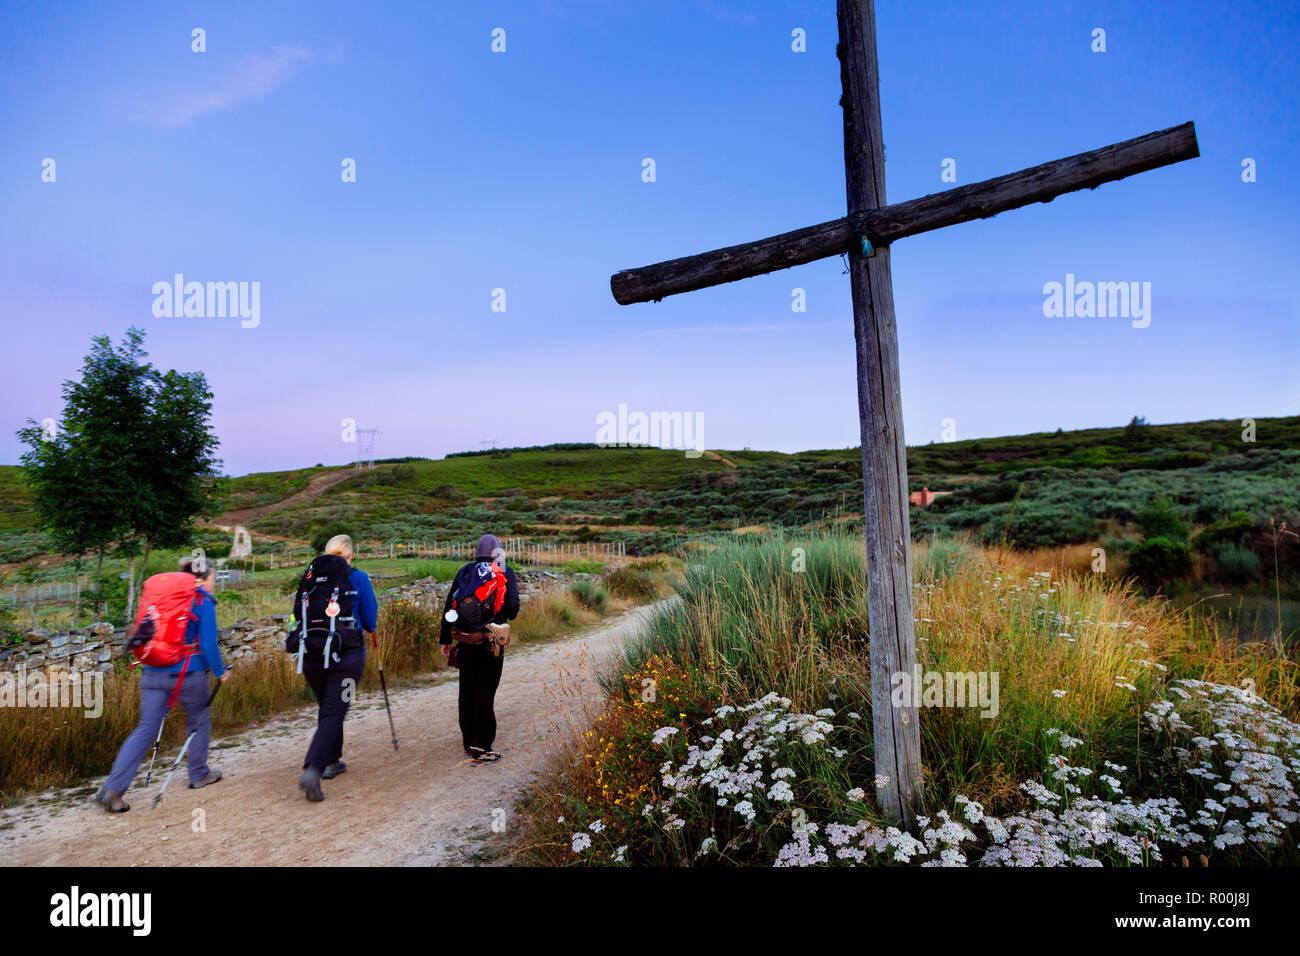 Camino de Santiago (Spain) - Pilgrims  walking along the way of St.James in the Bierzo landscape Stock Photo